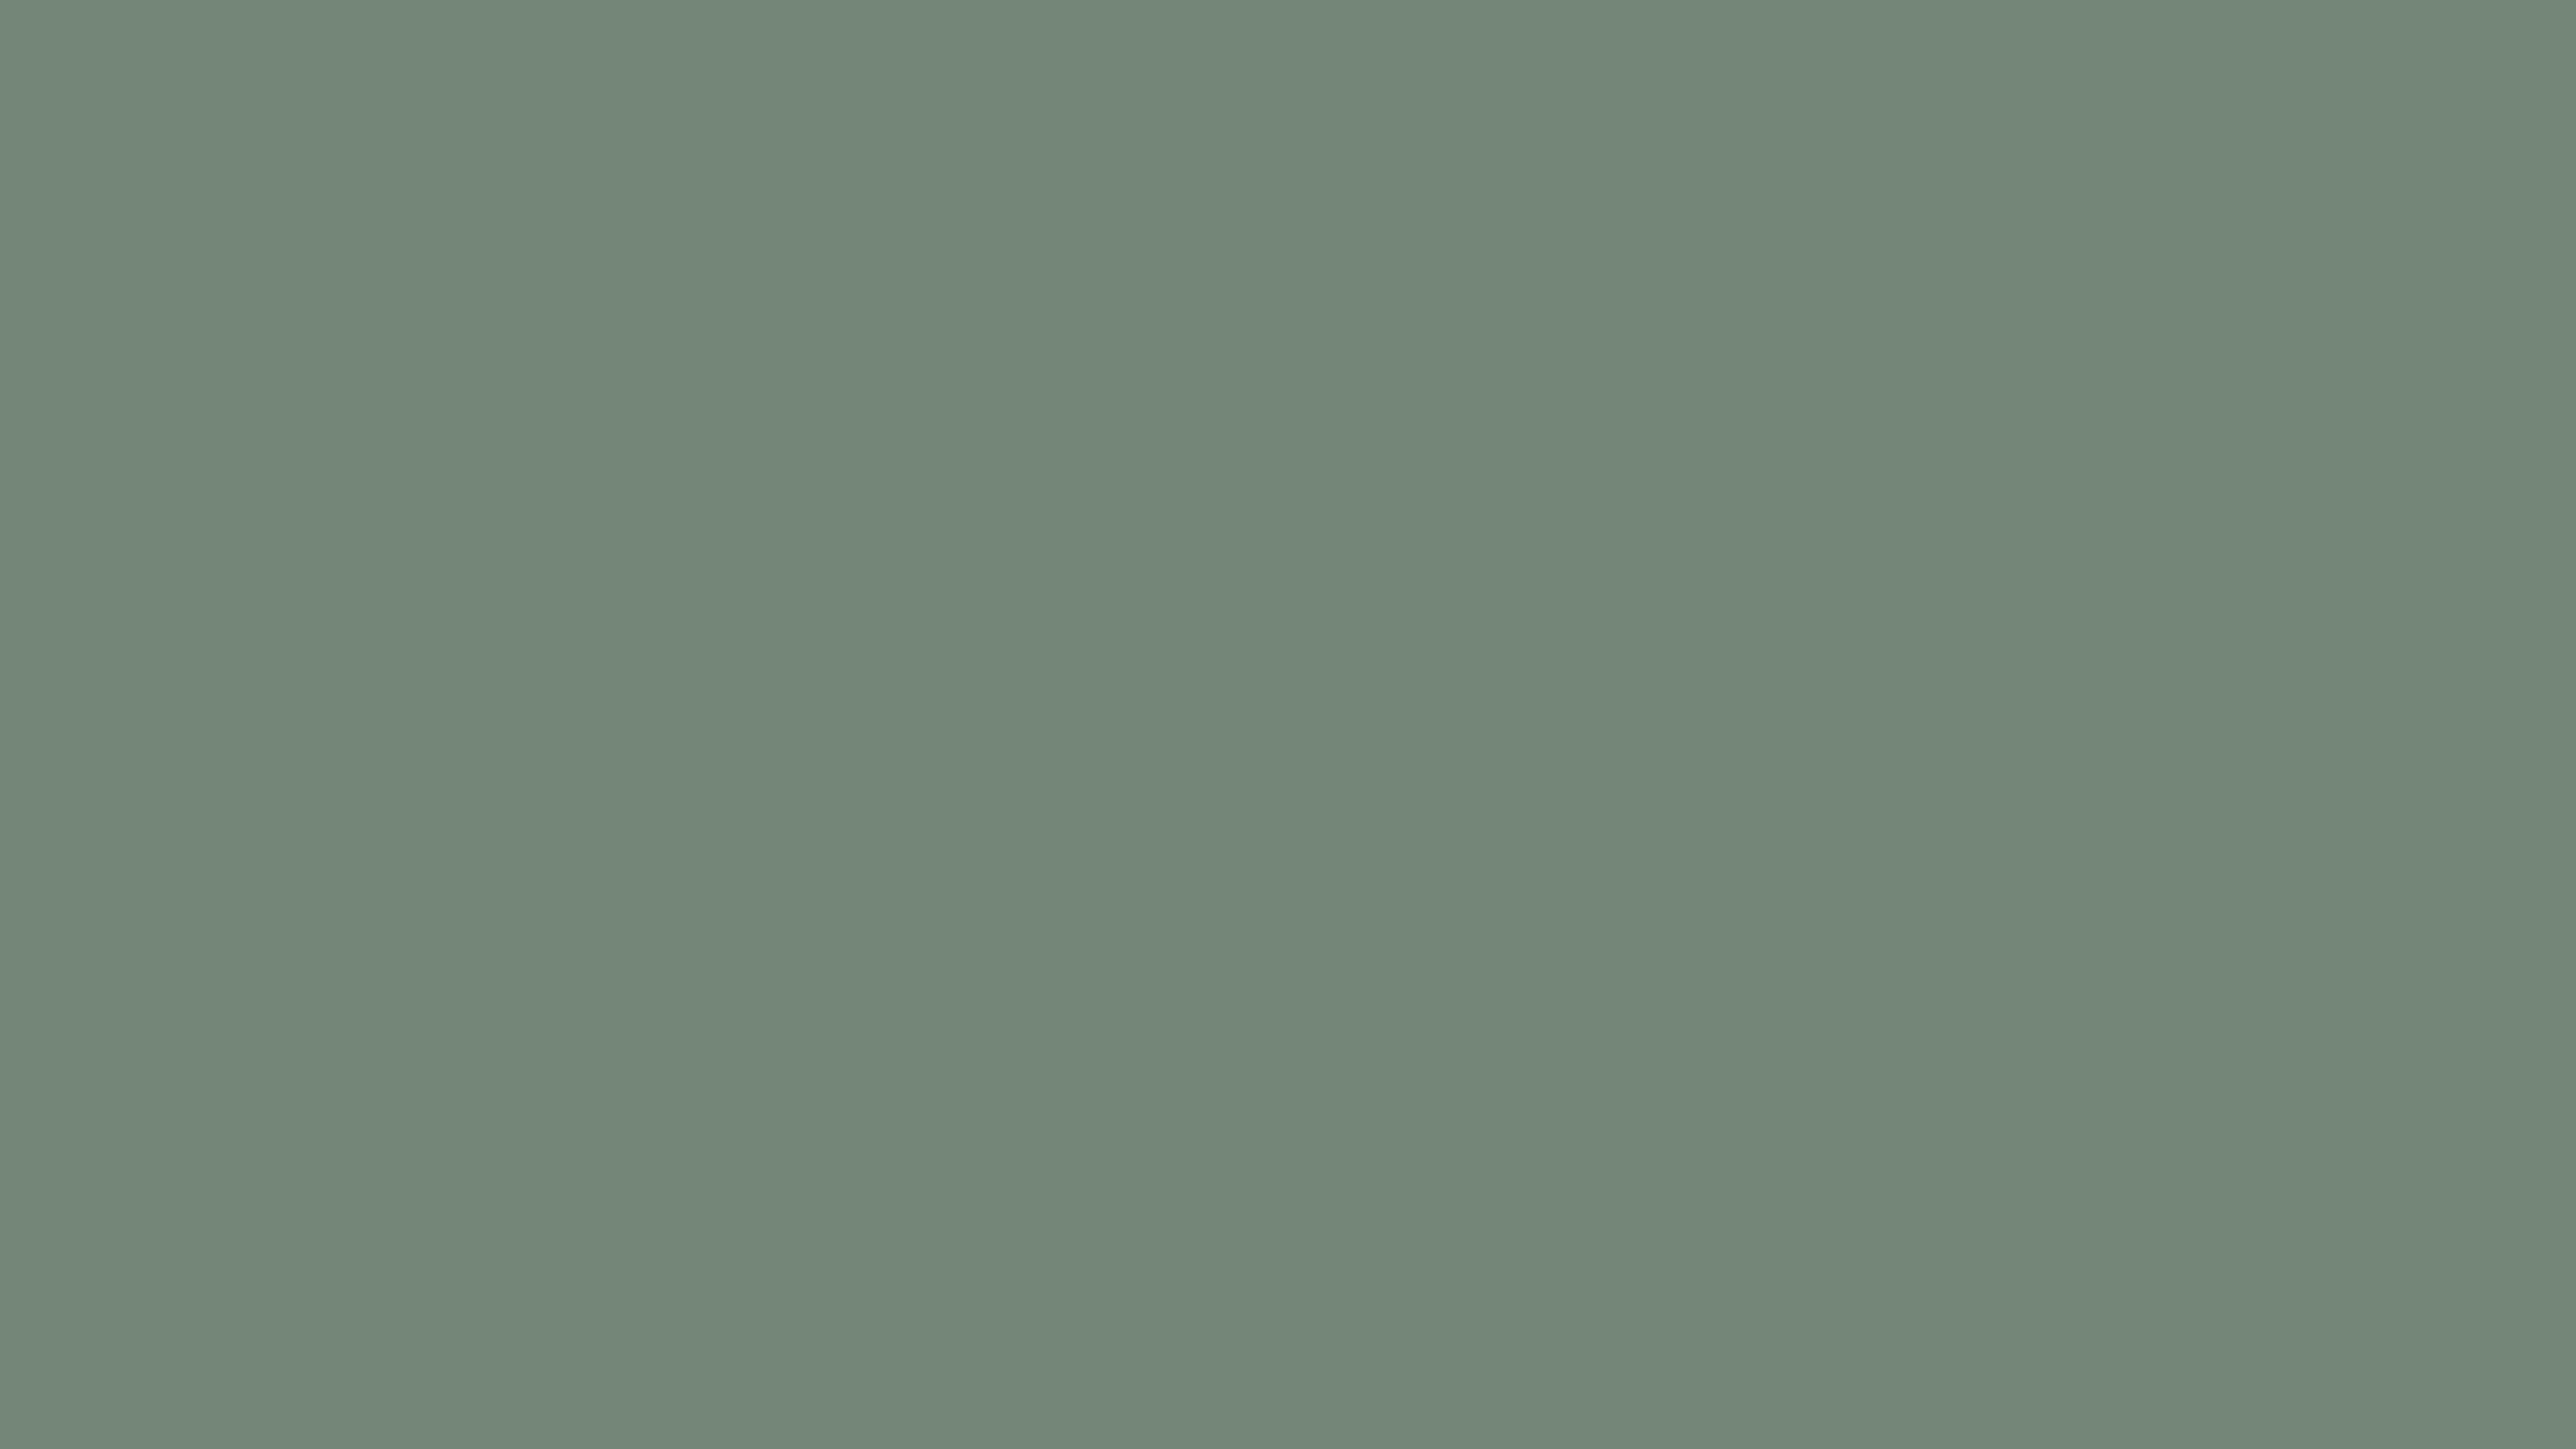 Xanadu Solid Color Background Wallpaper [5120x2880]